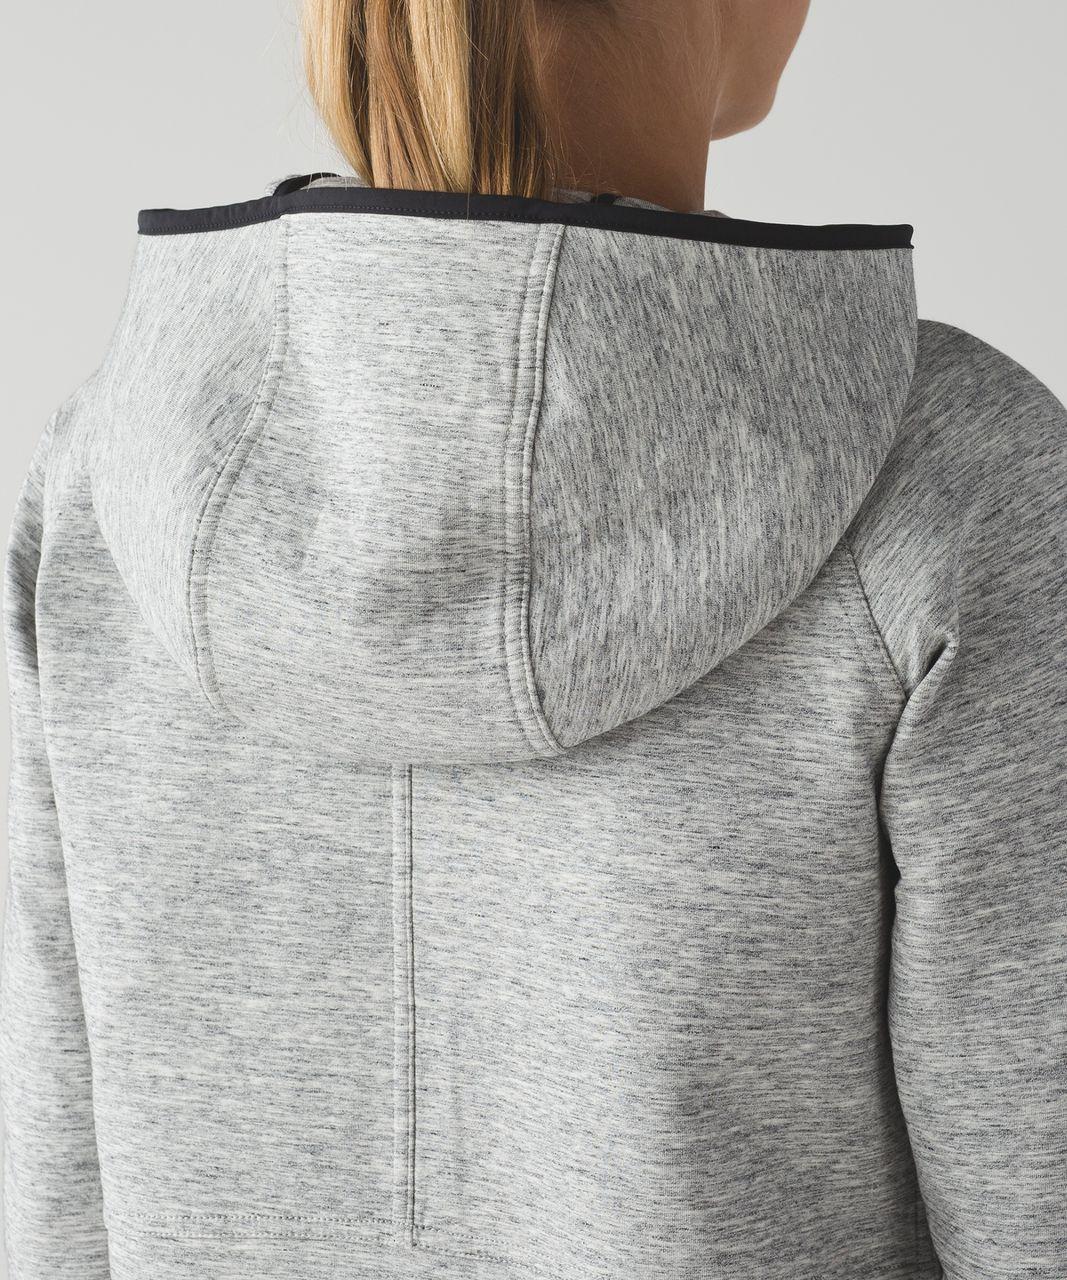 Lululemon City Bound Hoodie - Heathered Space Dyed Medium Grey / Heathered Space Dyed Medium Grey